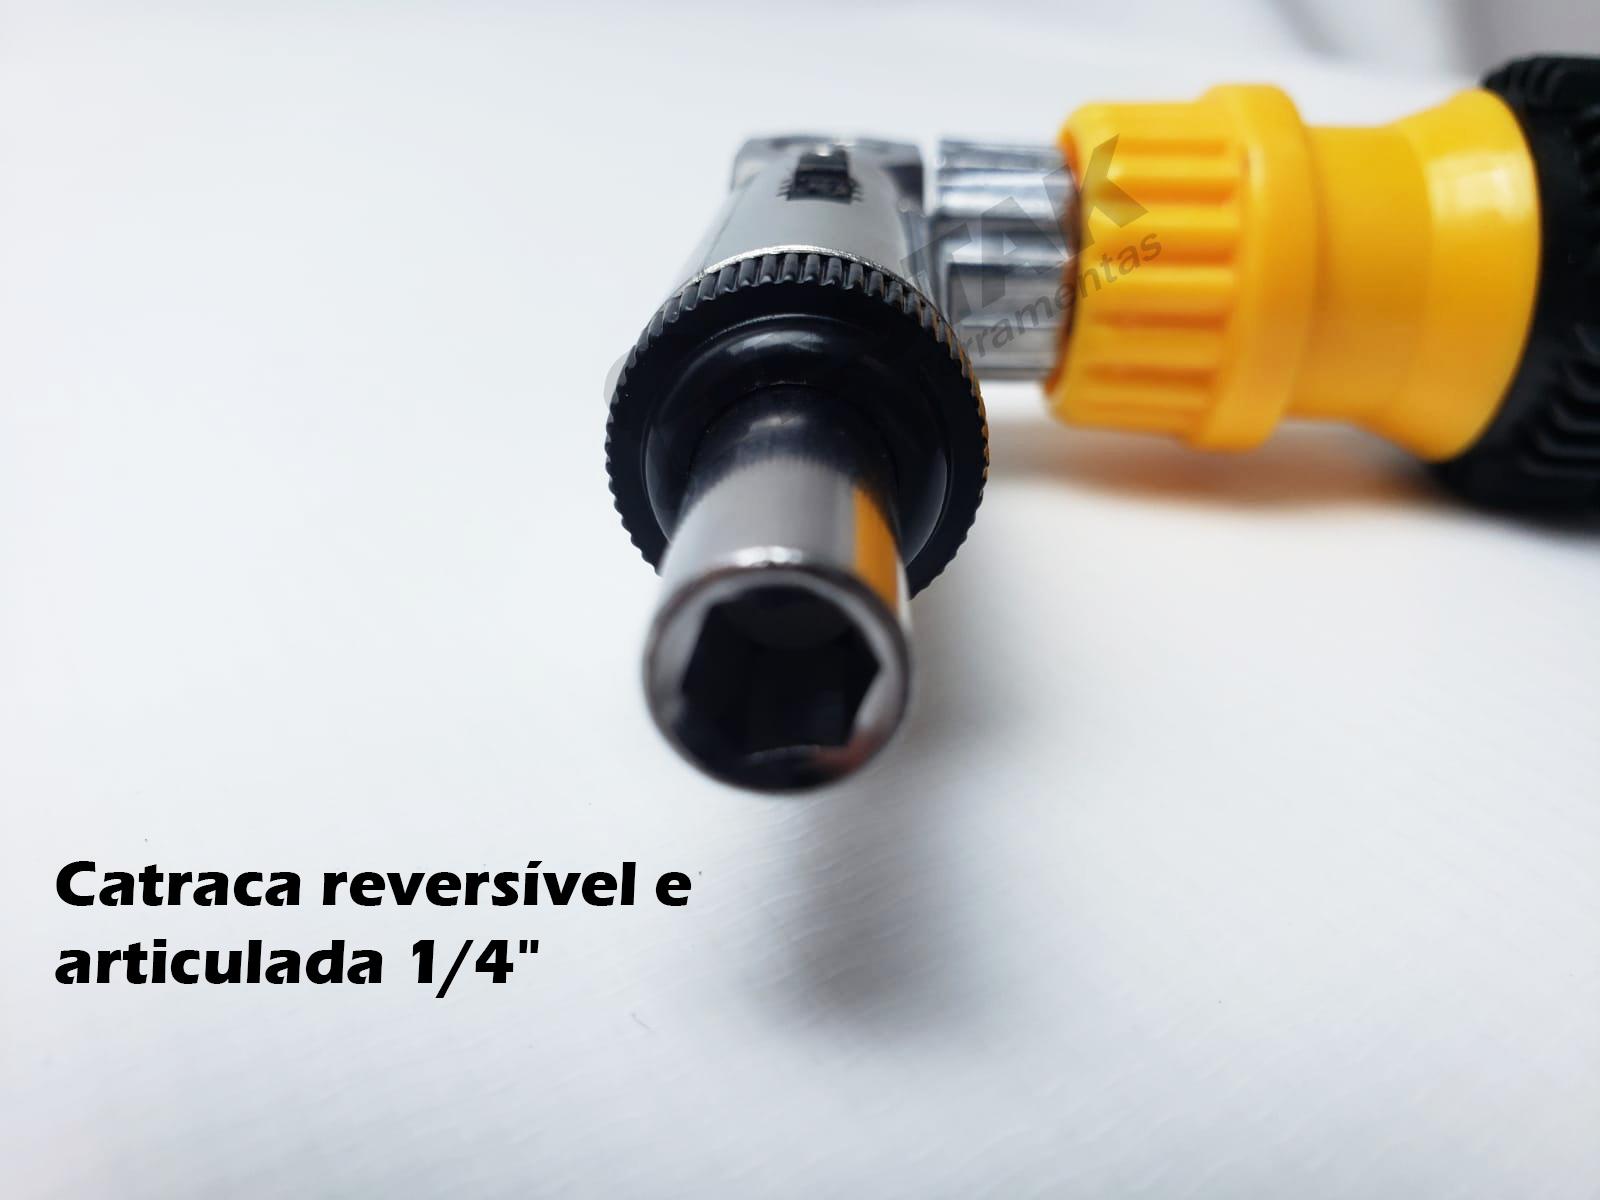 Kit Chave soquete Com Catraca reversivel C/ Cinta Catraca